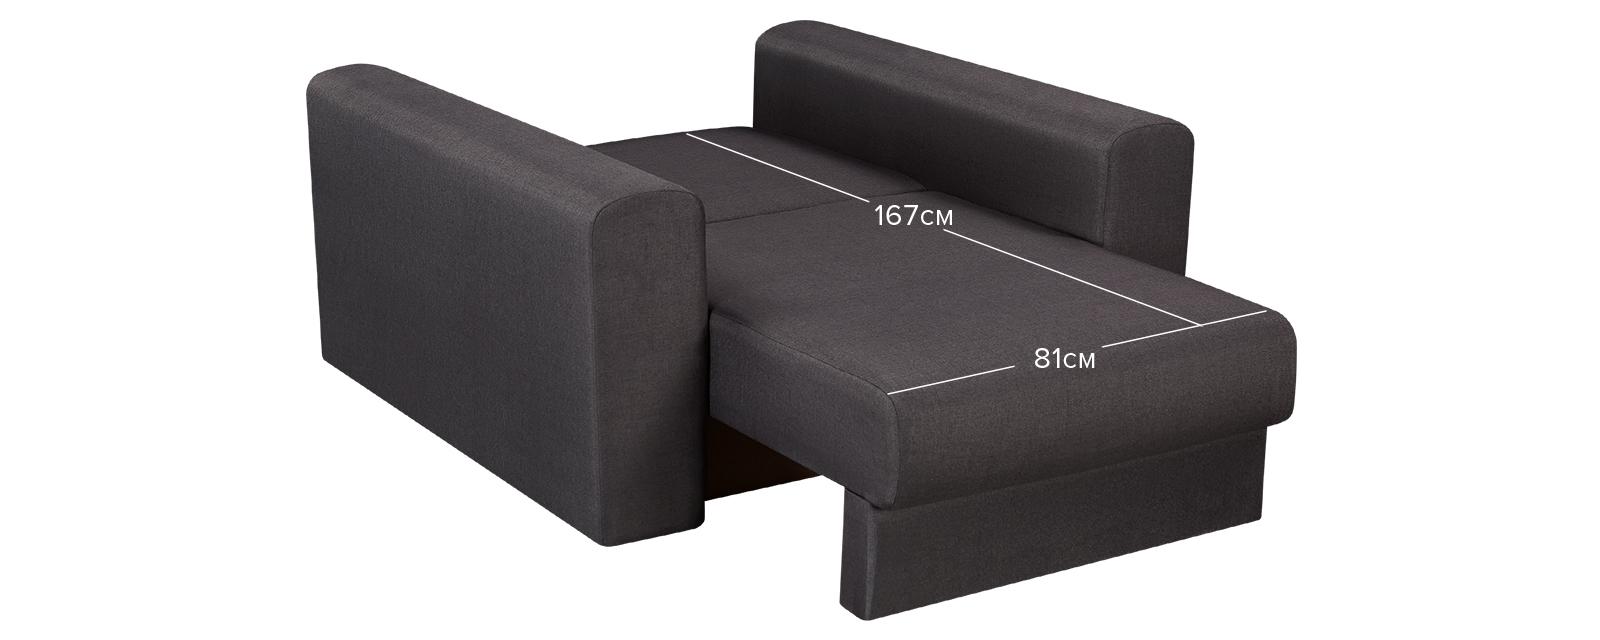 Кресло тканевое Медисон 80 см Kiton тёмно-серый (Рогожка)